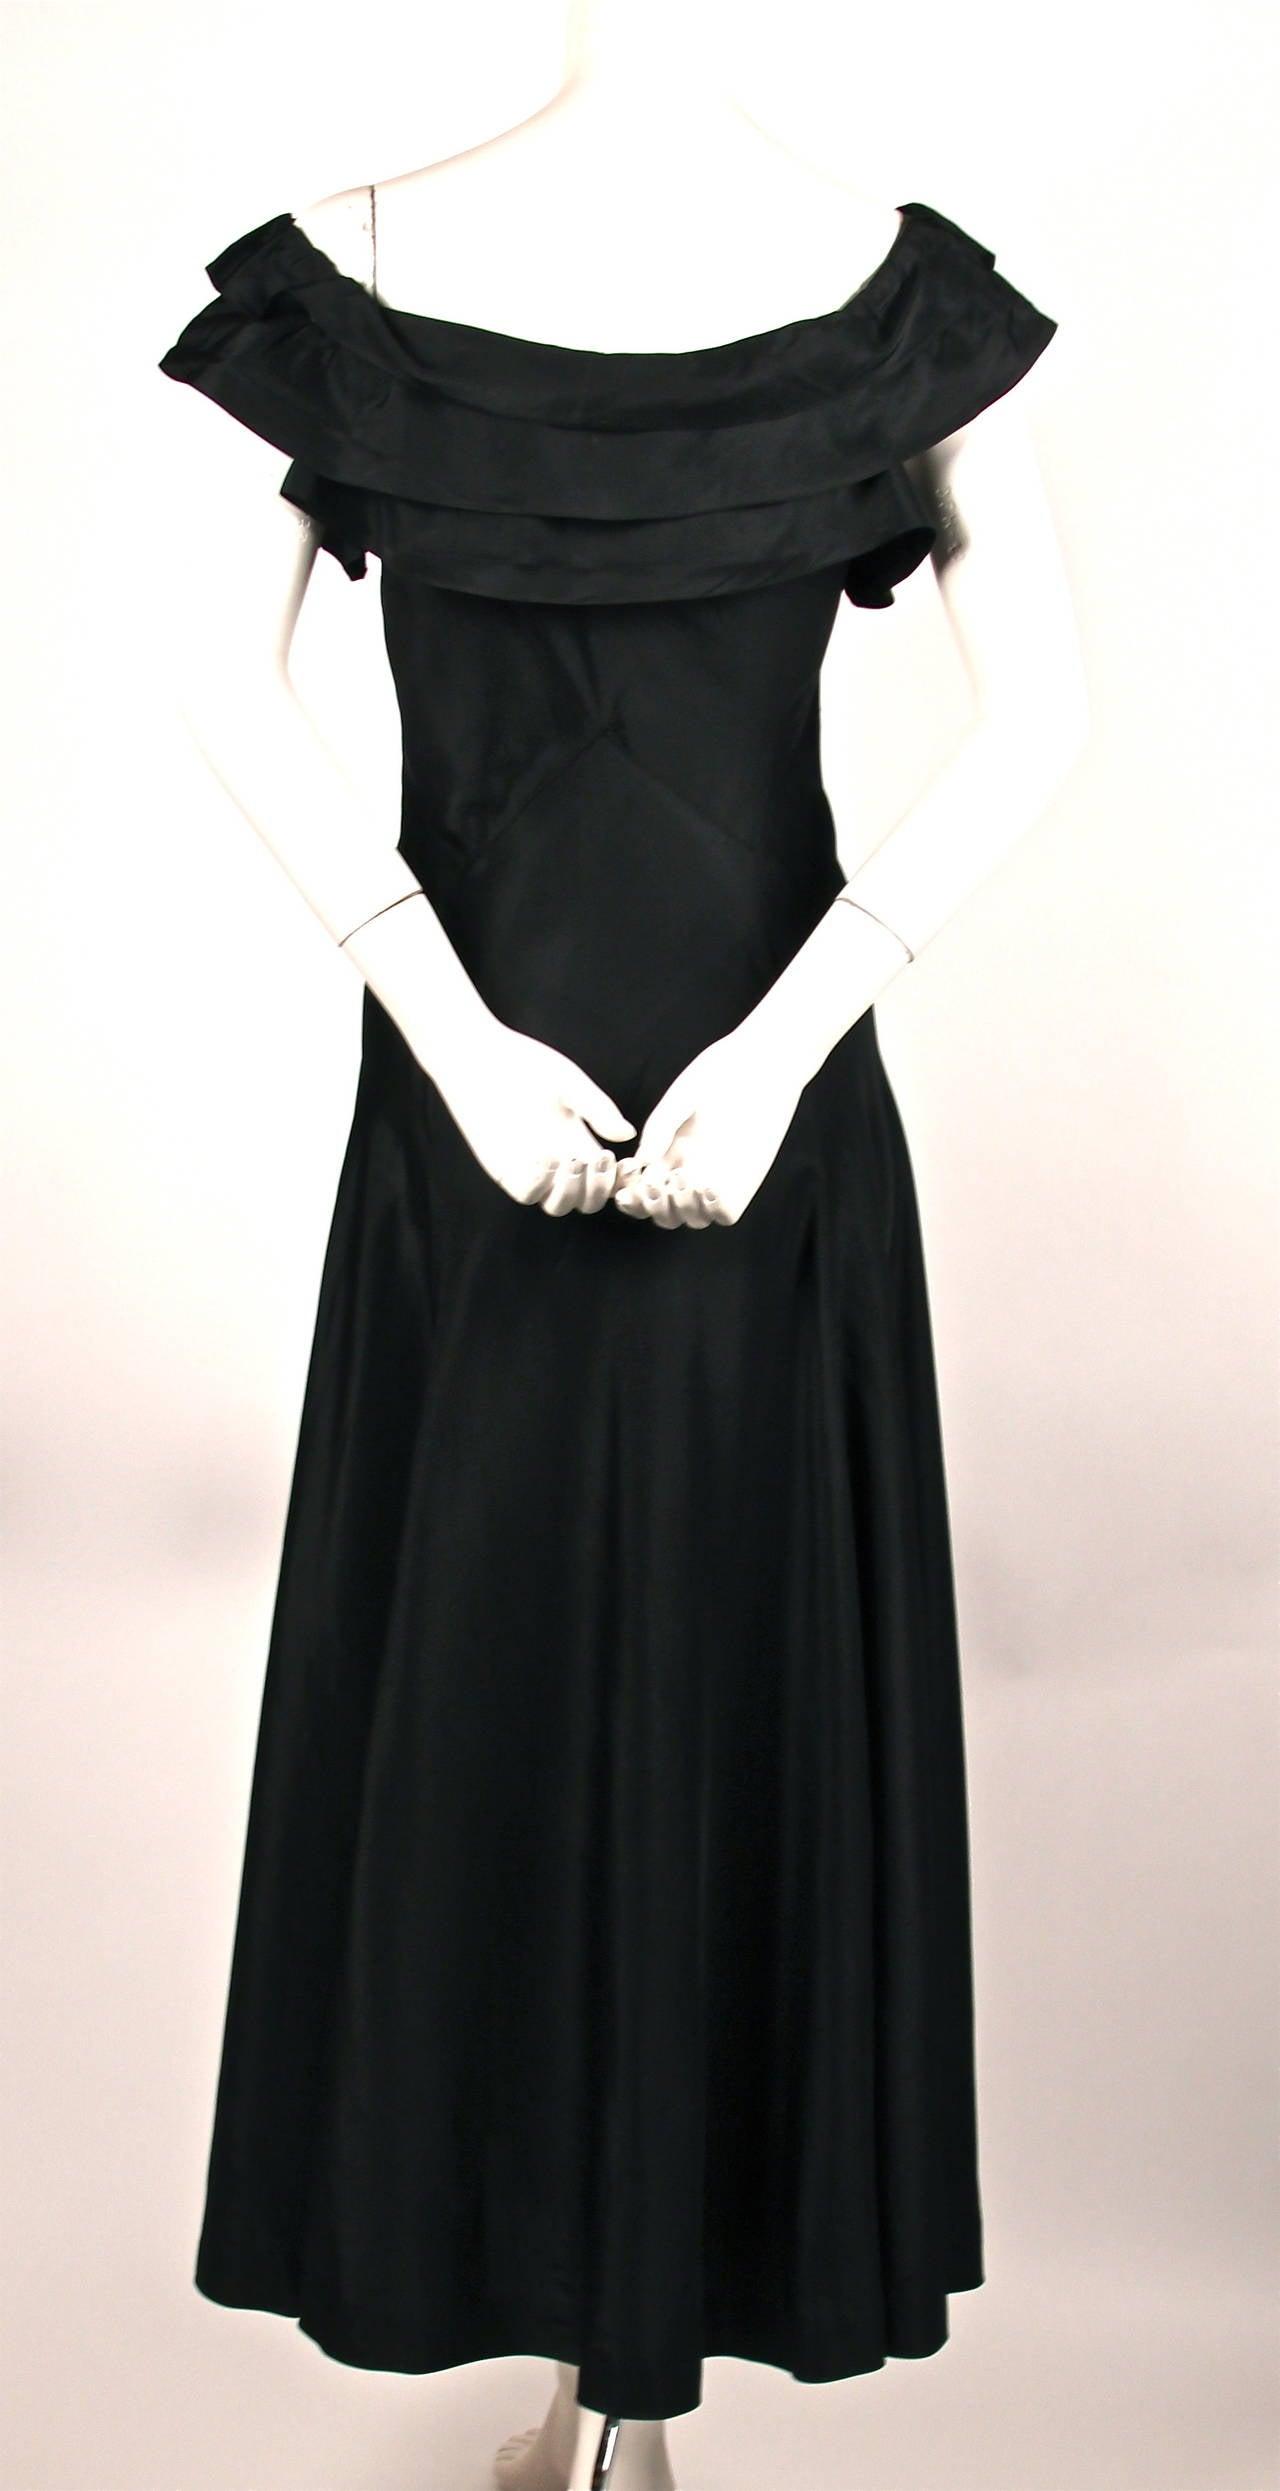 Rare 1933 jeanne lanvin haute couture black evening dress for Haute couture dress price